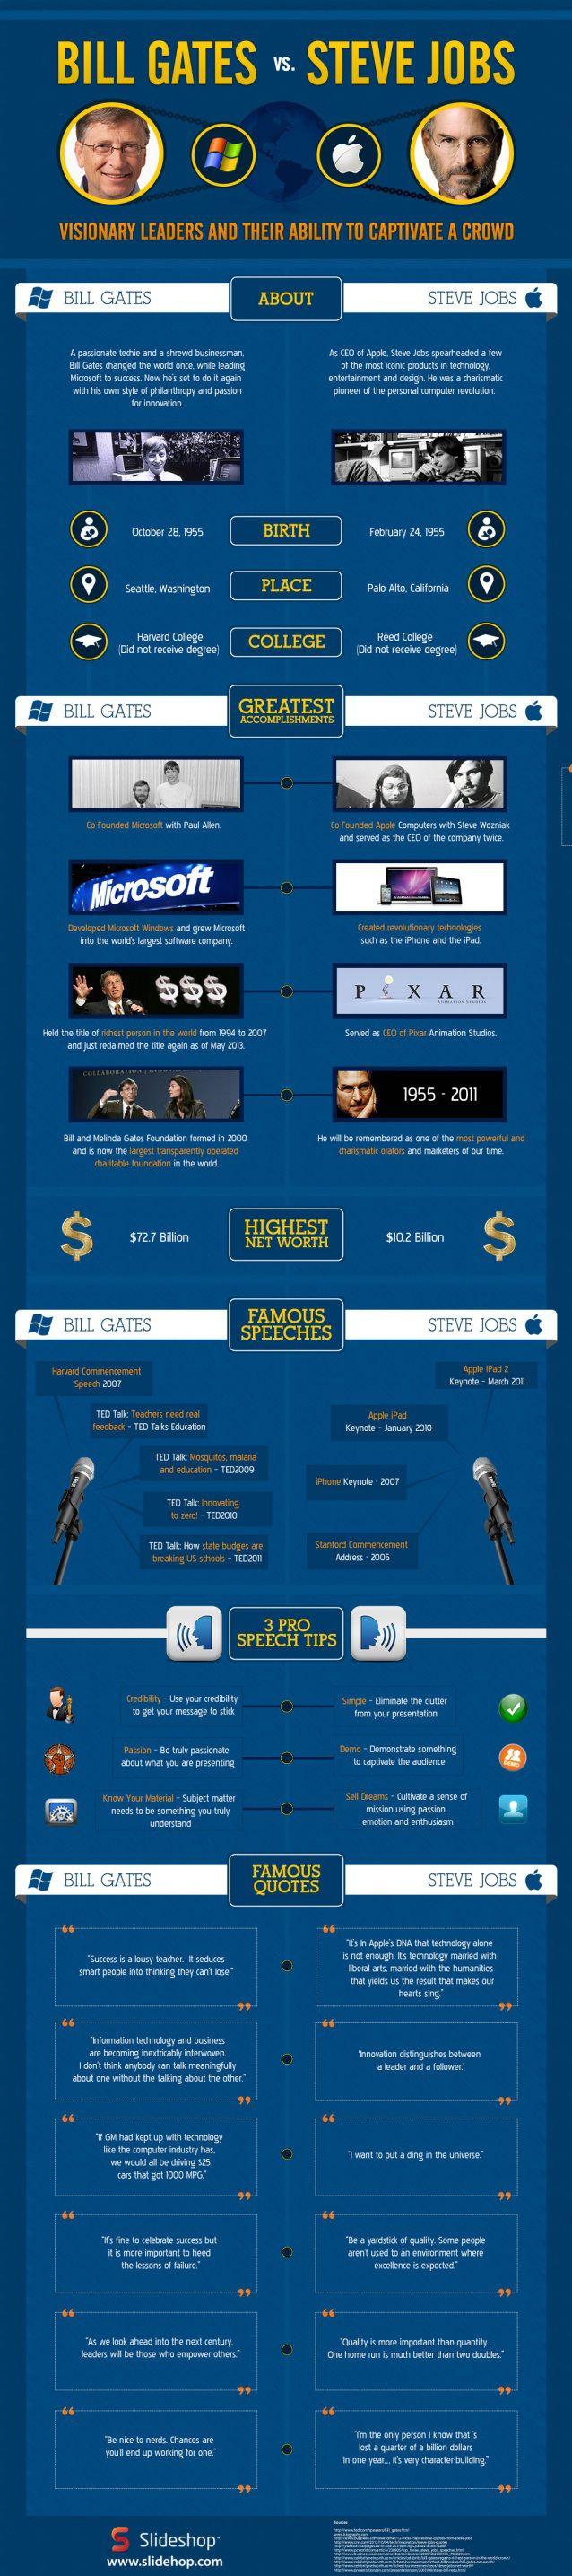 Bill Gates vs Steve Jobs #infografia #infographic #microsoft #apple